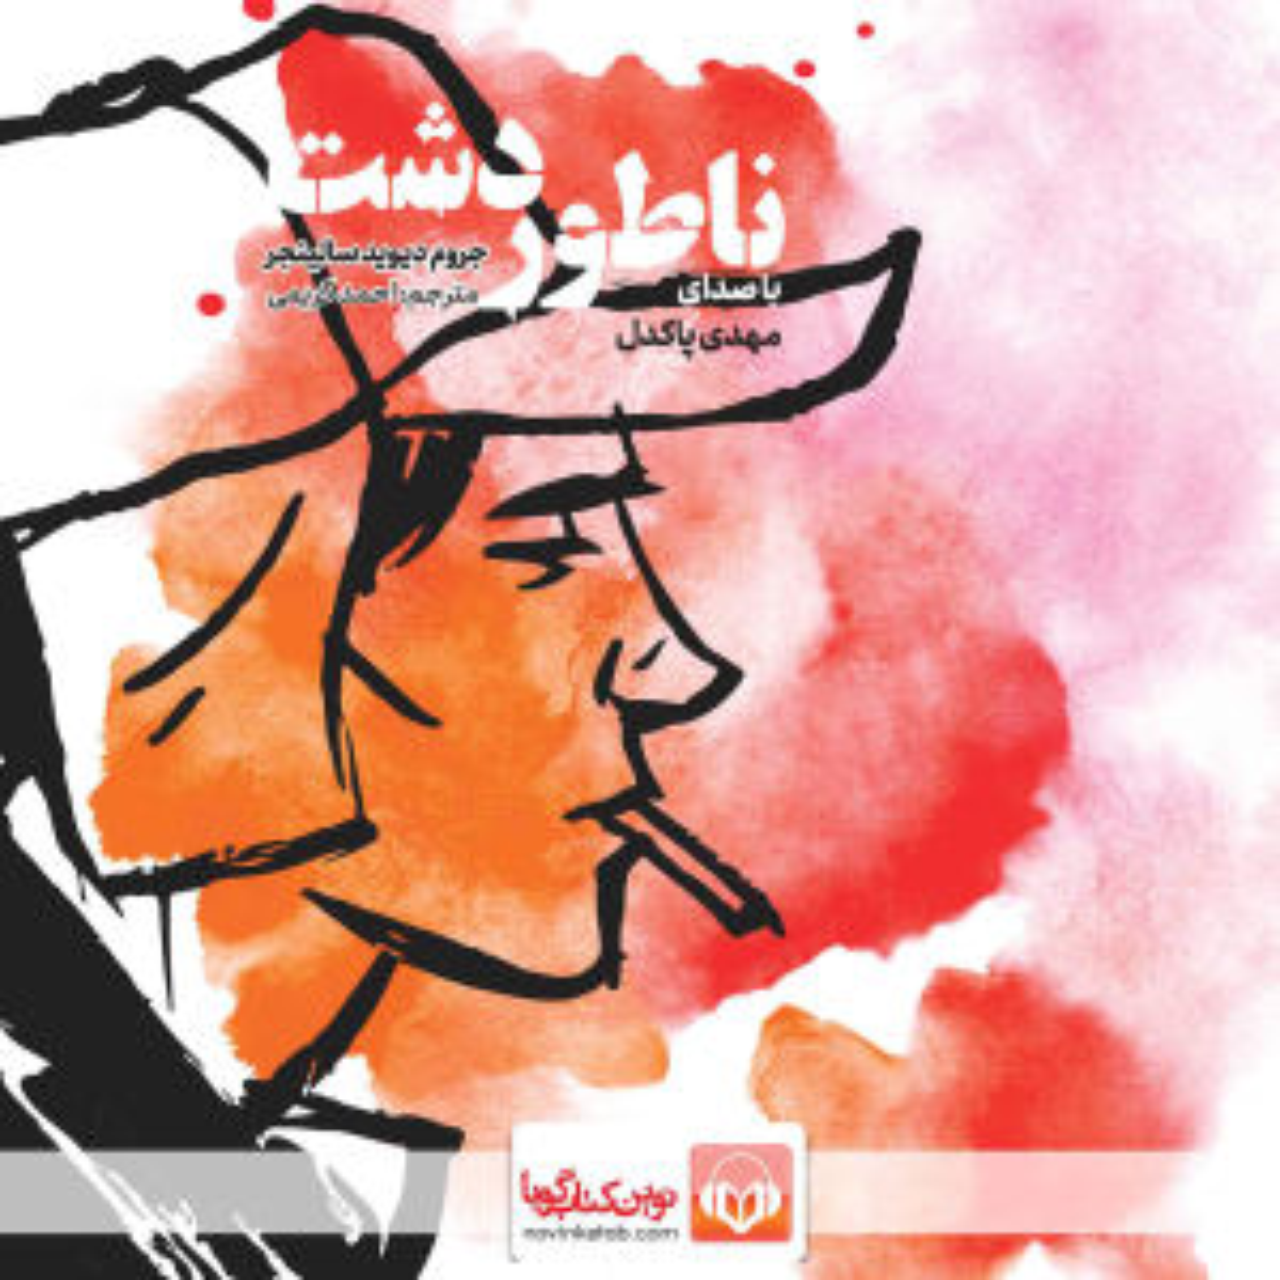 کتاب صوتی ناطور دشت اثر جروم دیوید سالینجر